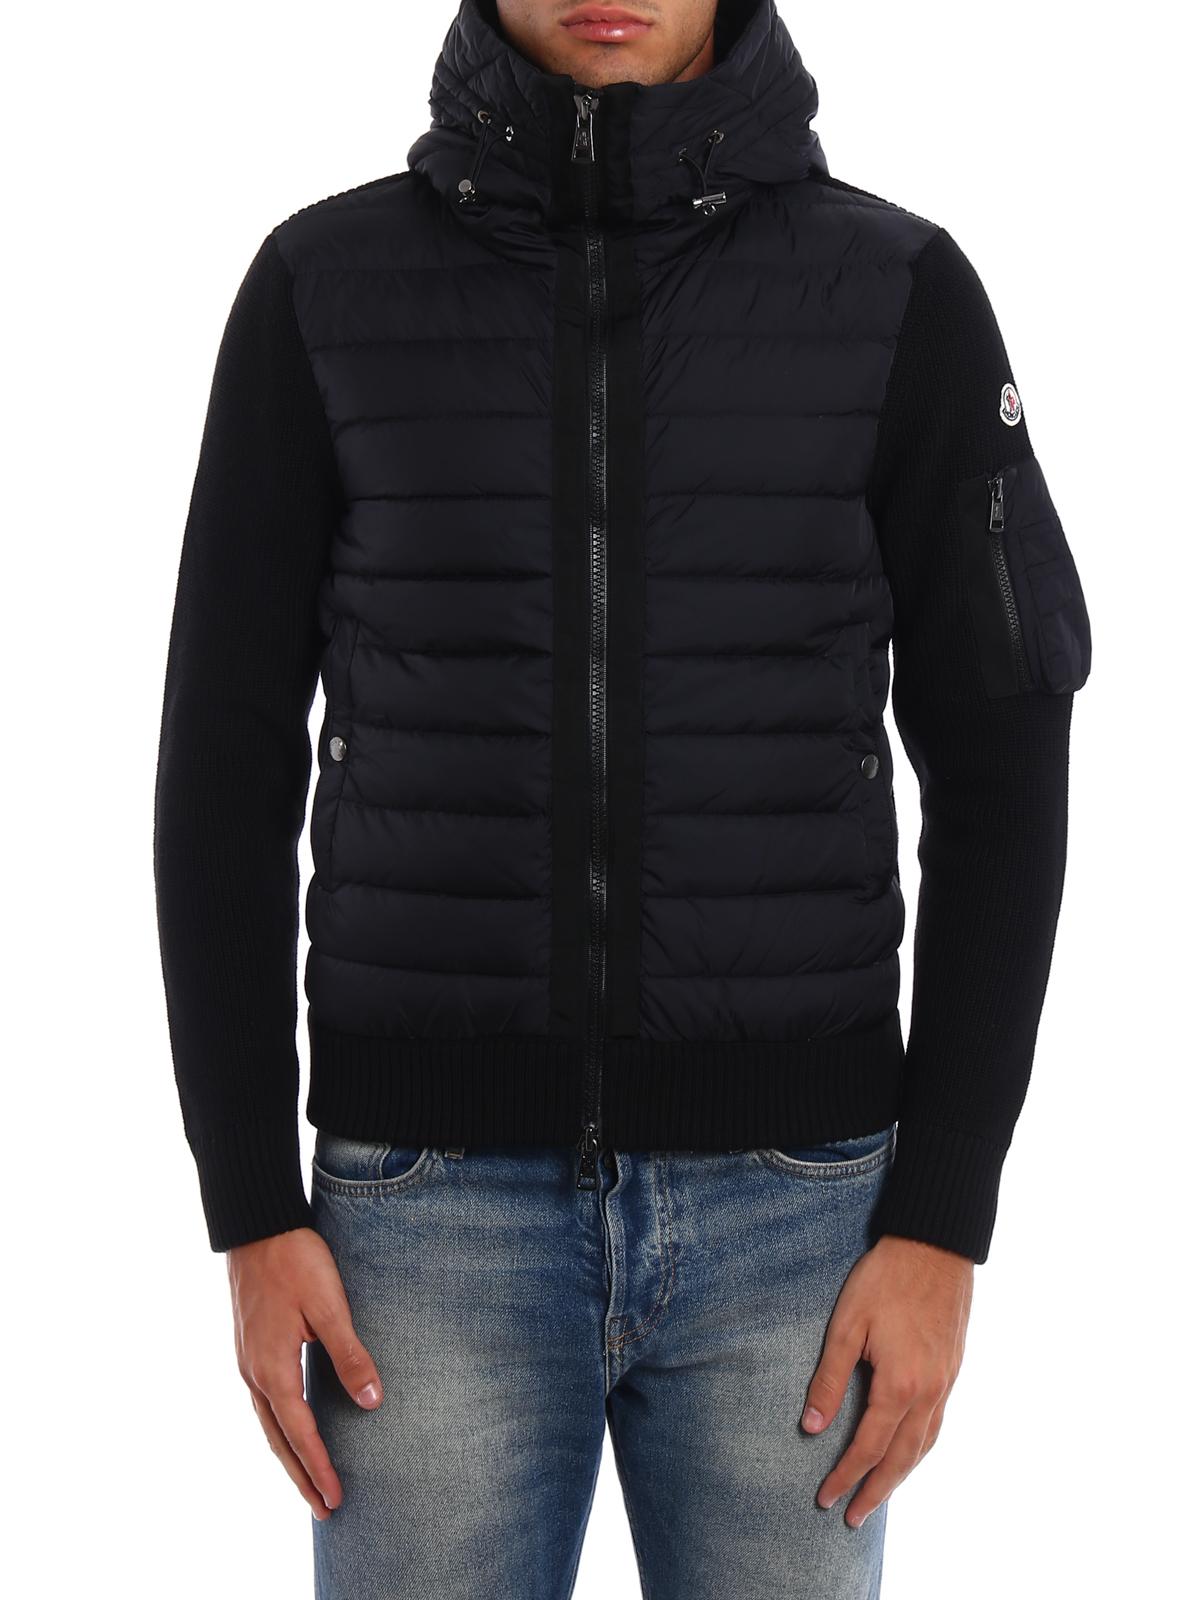 b37ebaf18 Moncler - Front padded tricot cardigan - cardigans - C2 091 9402800 ...